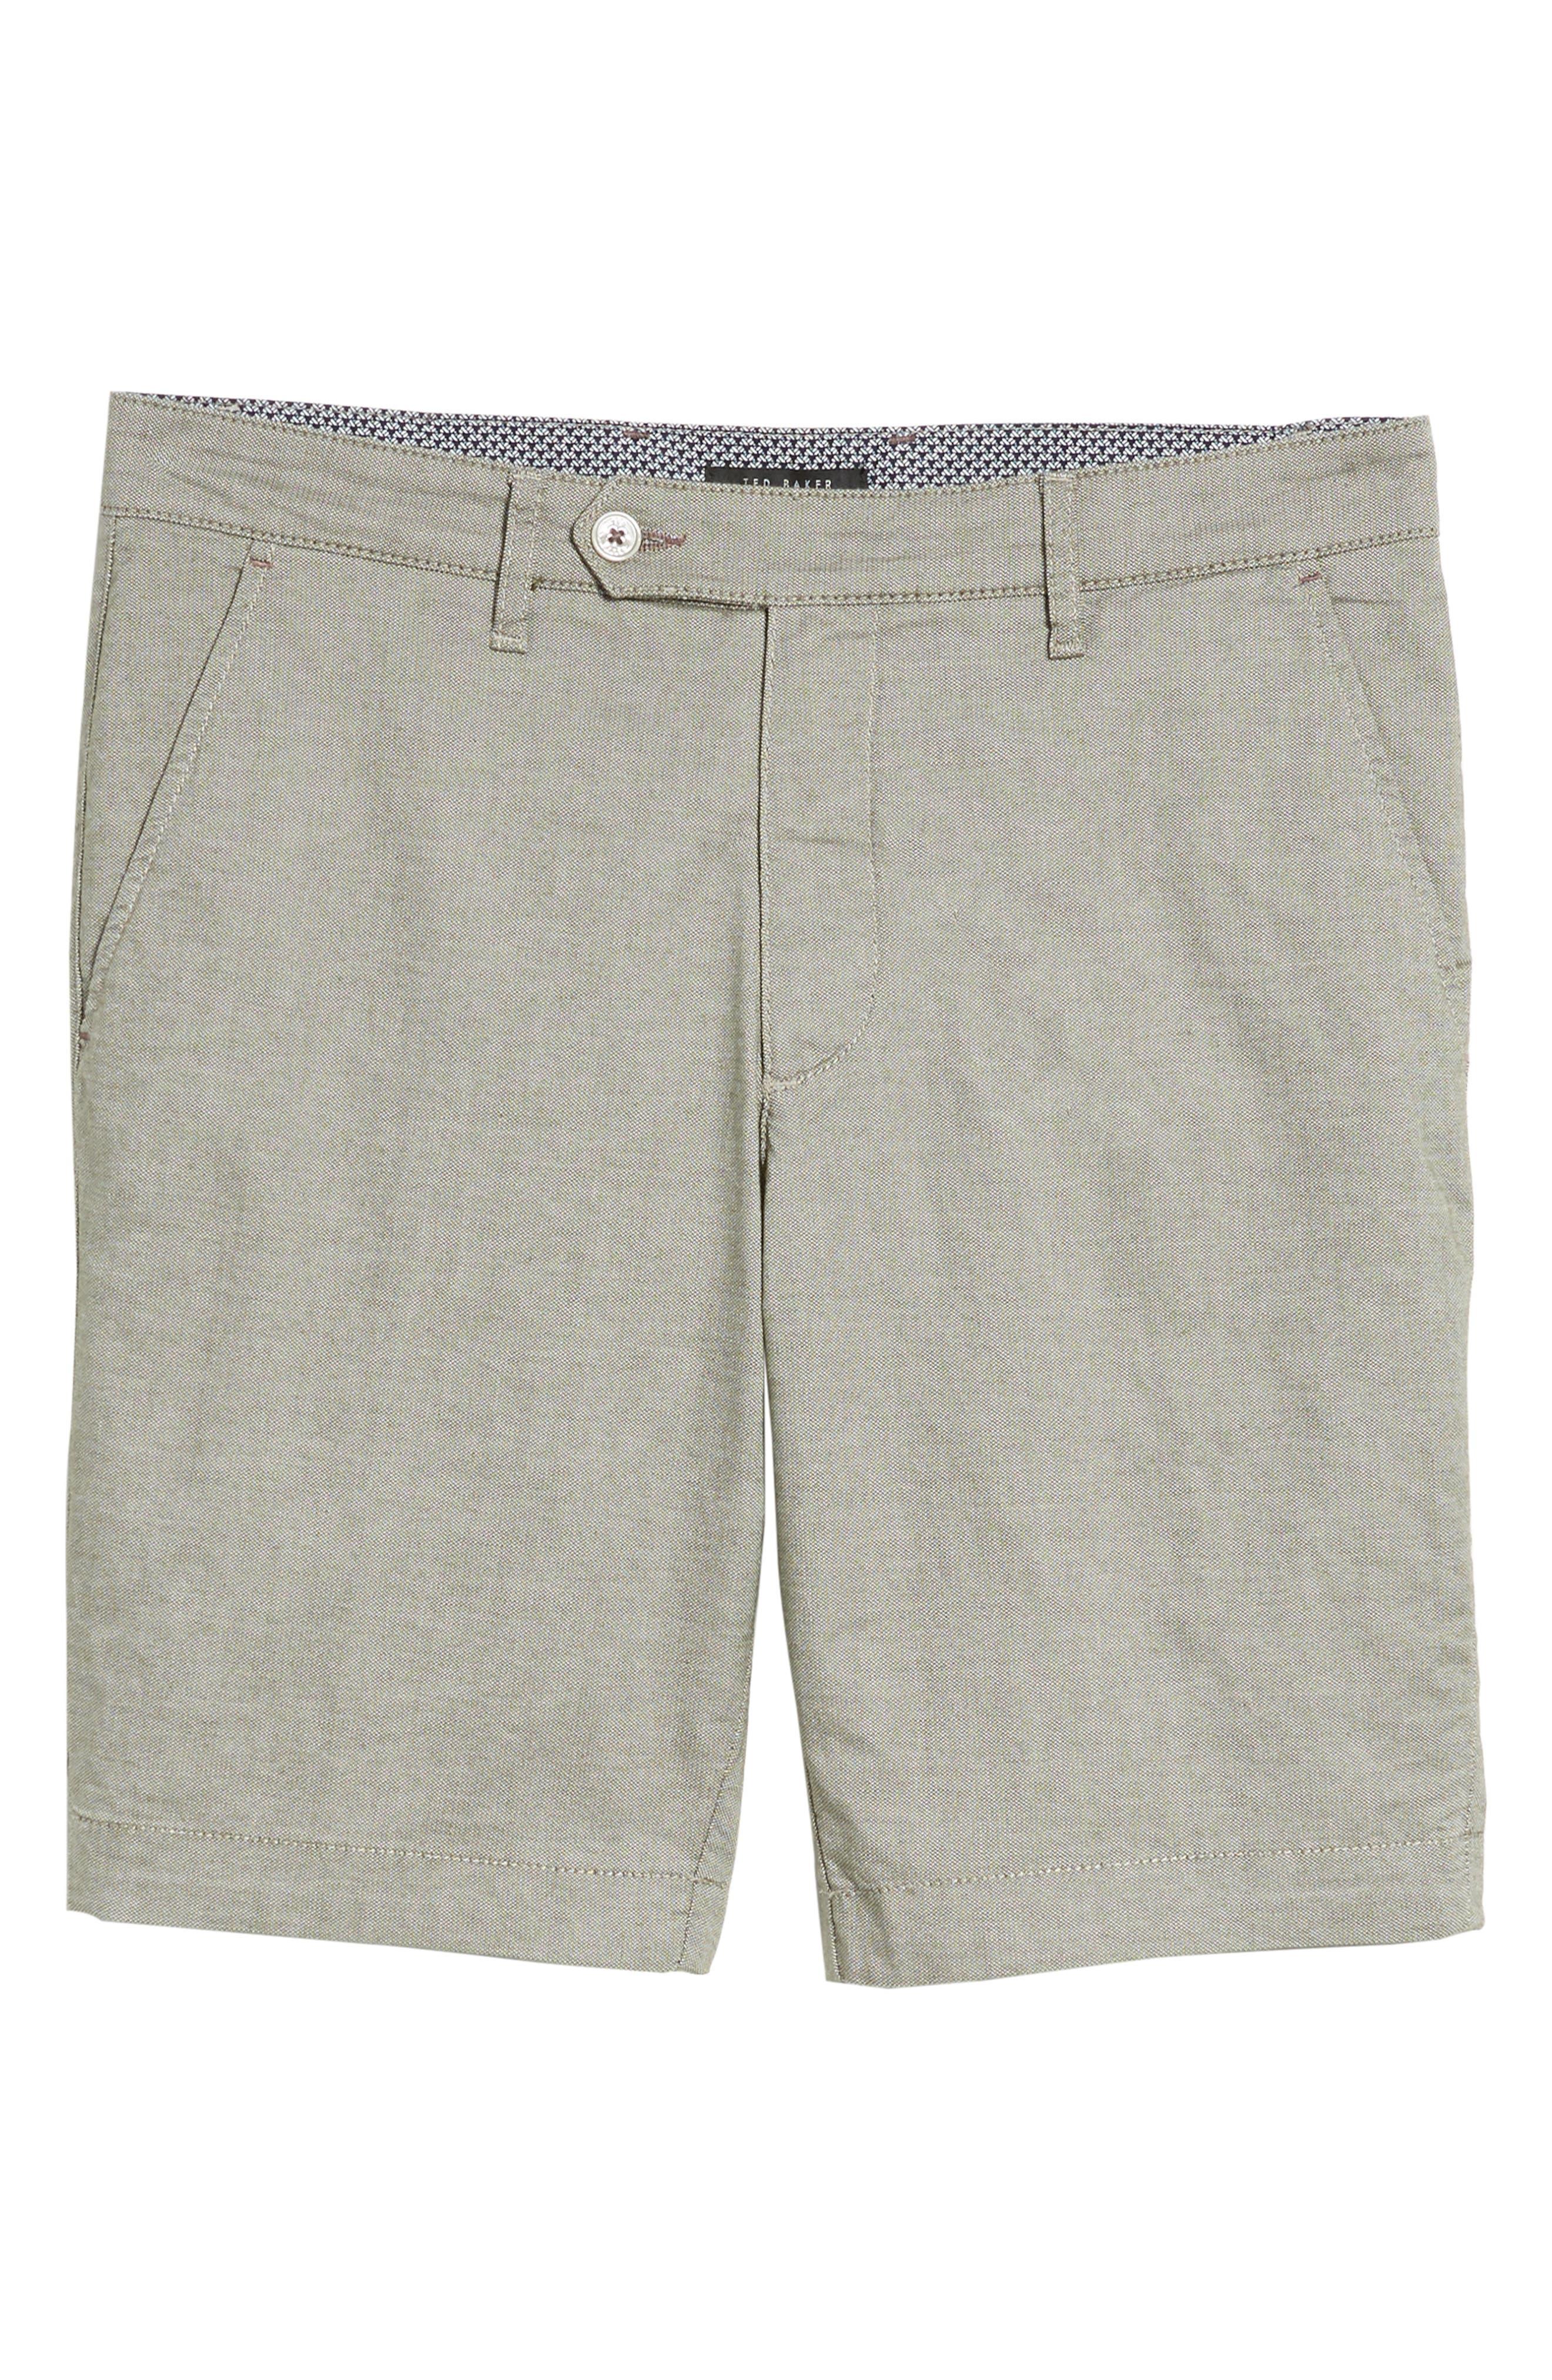 Herbosh Shorts,                             Alternate thumbnail 6, color,                             GREY MARL